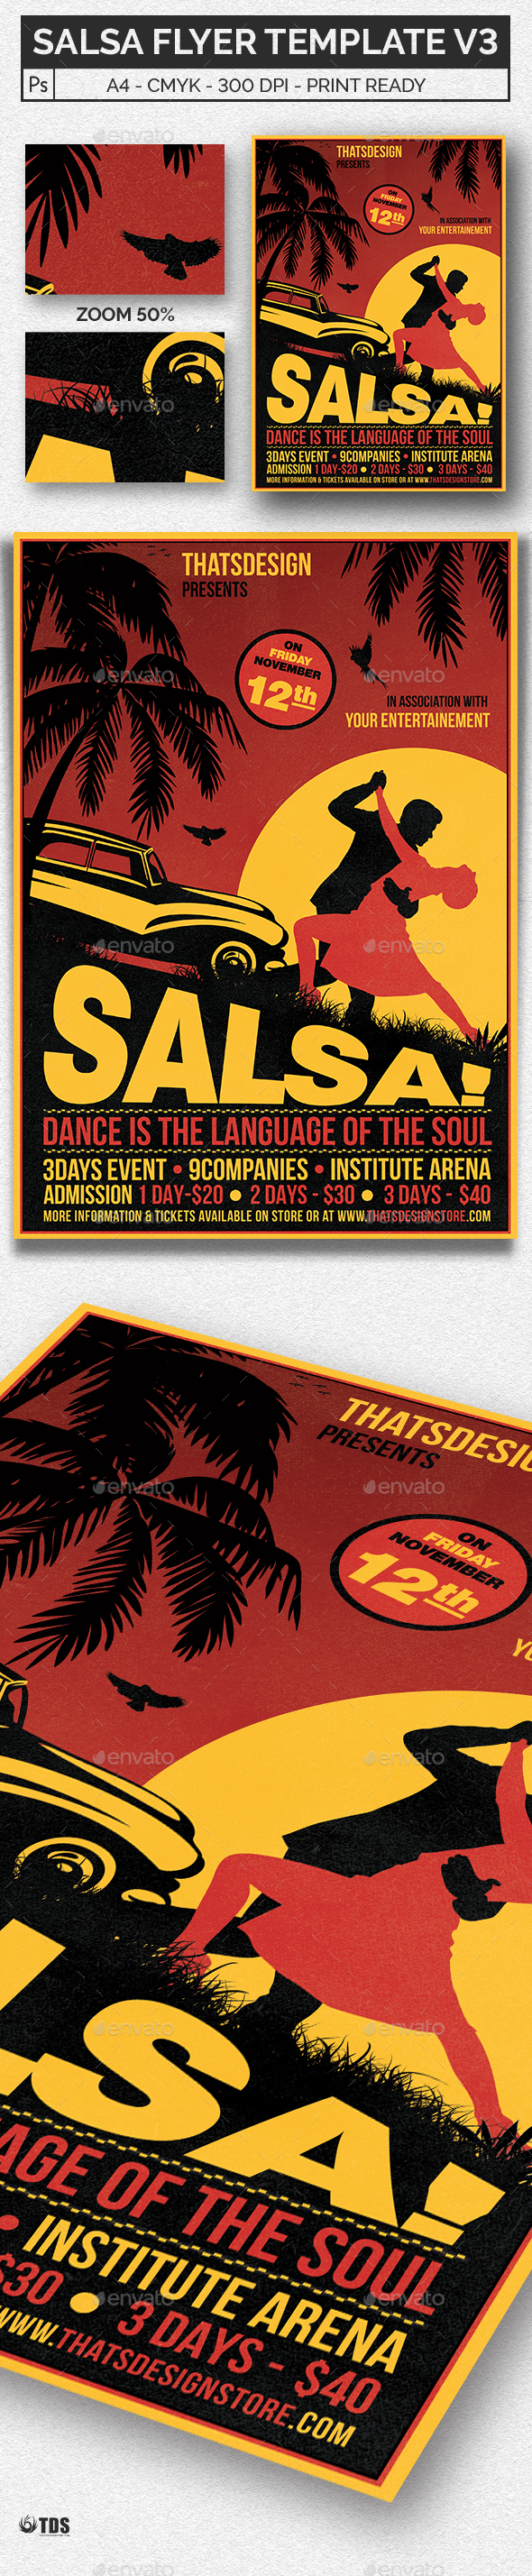 Salsa Flyer Template V3